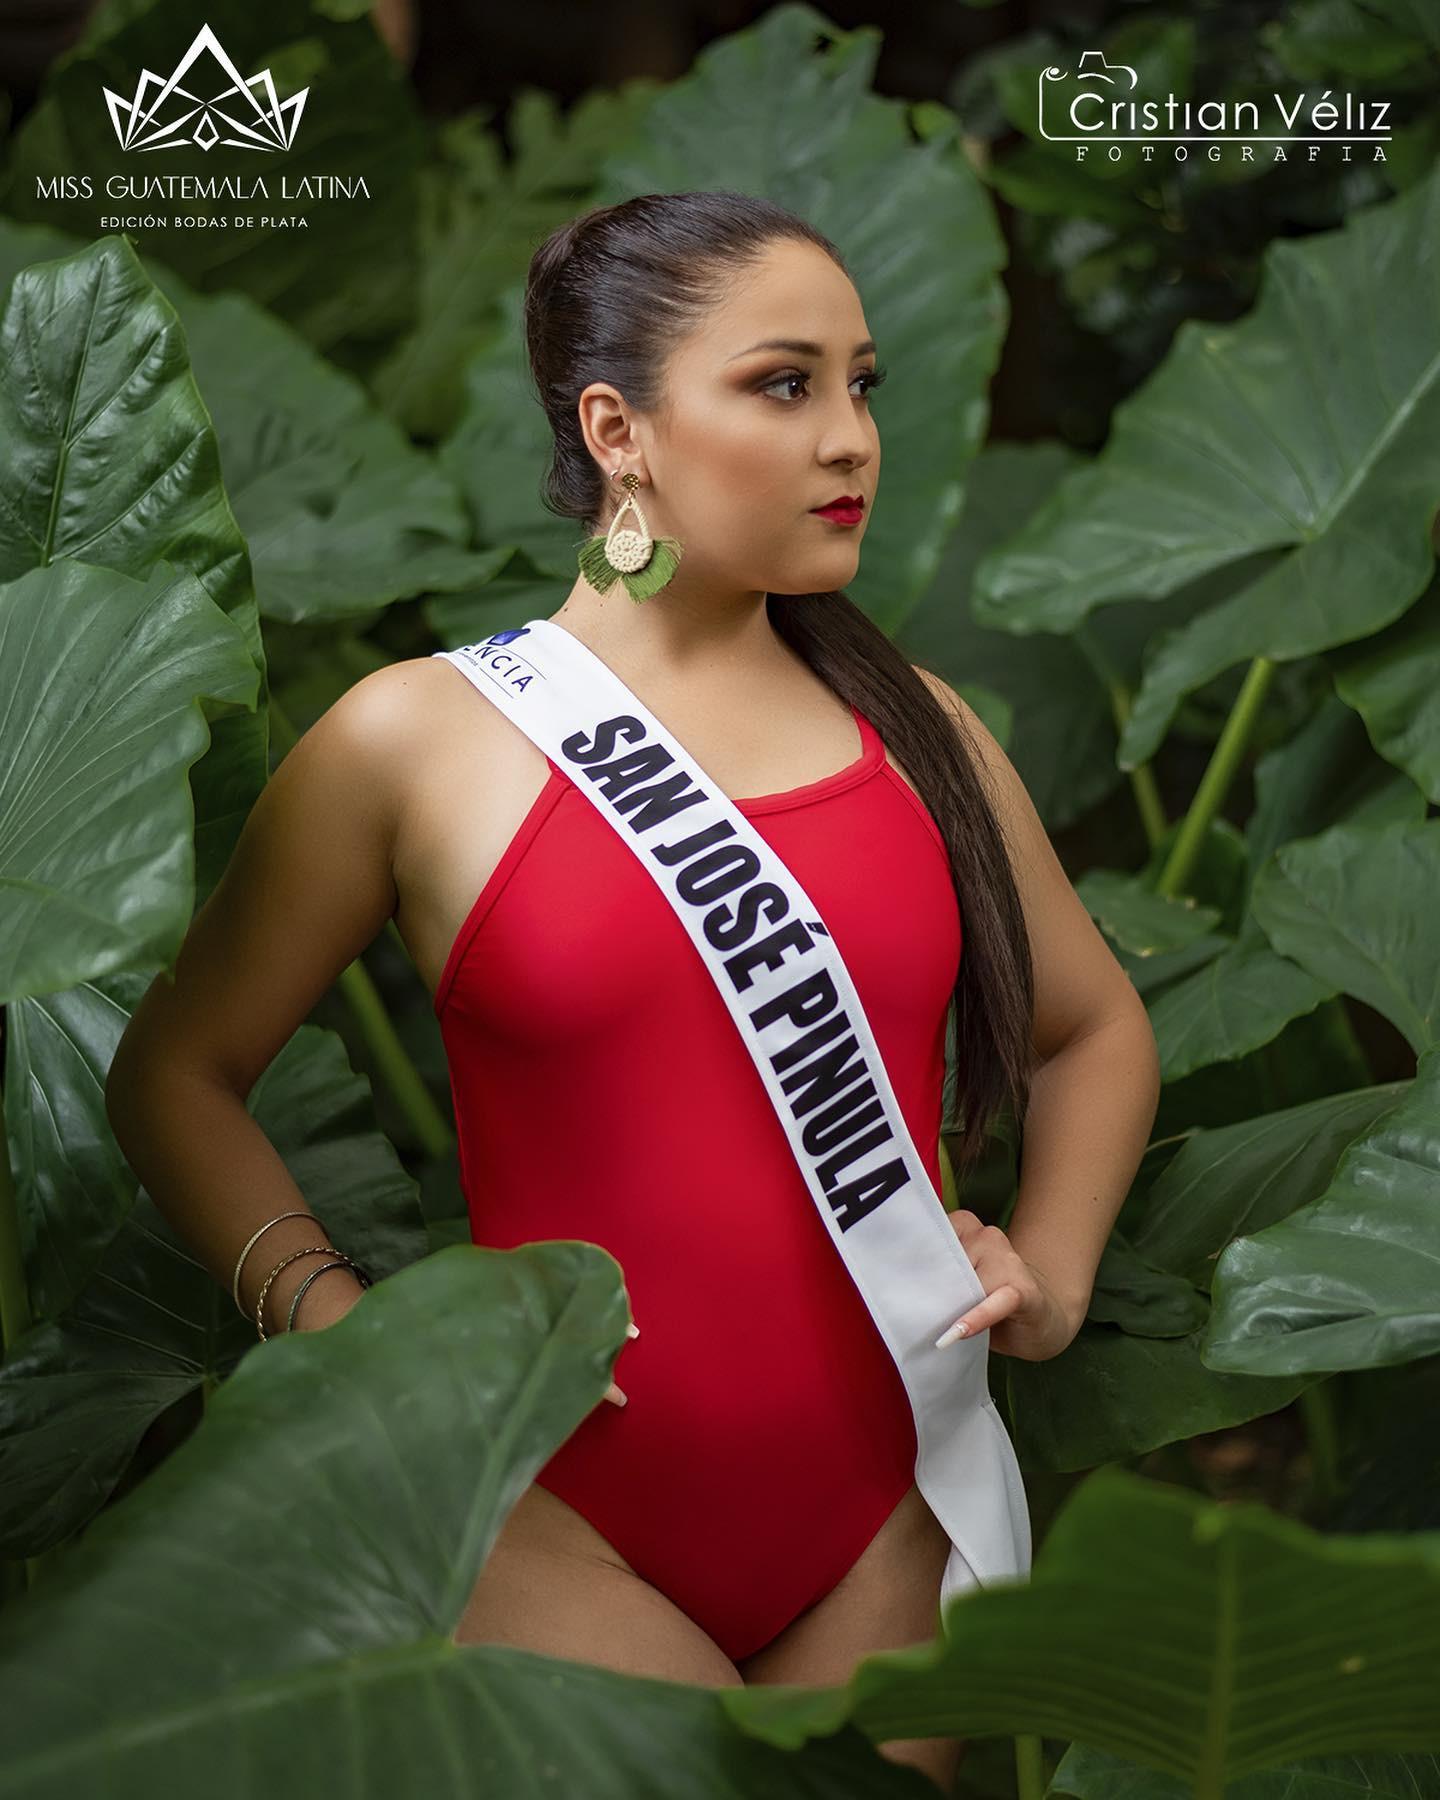 candidatas a miss guatemala latina 2021. final: 30 de abril. - Página 5 B3AT7t